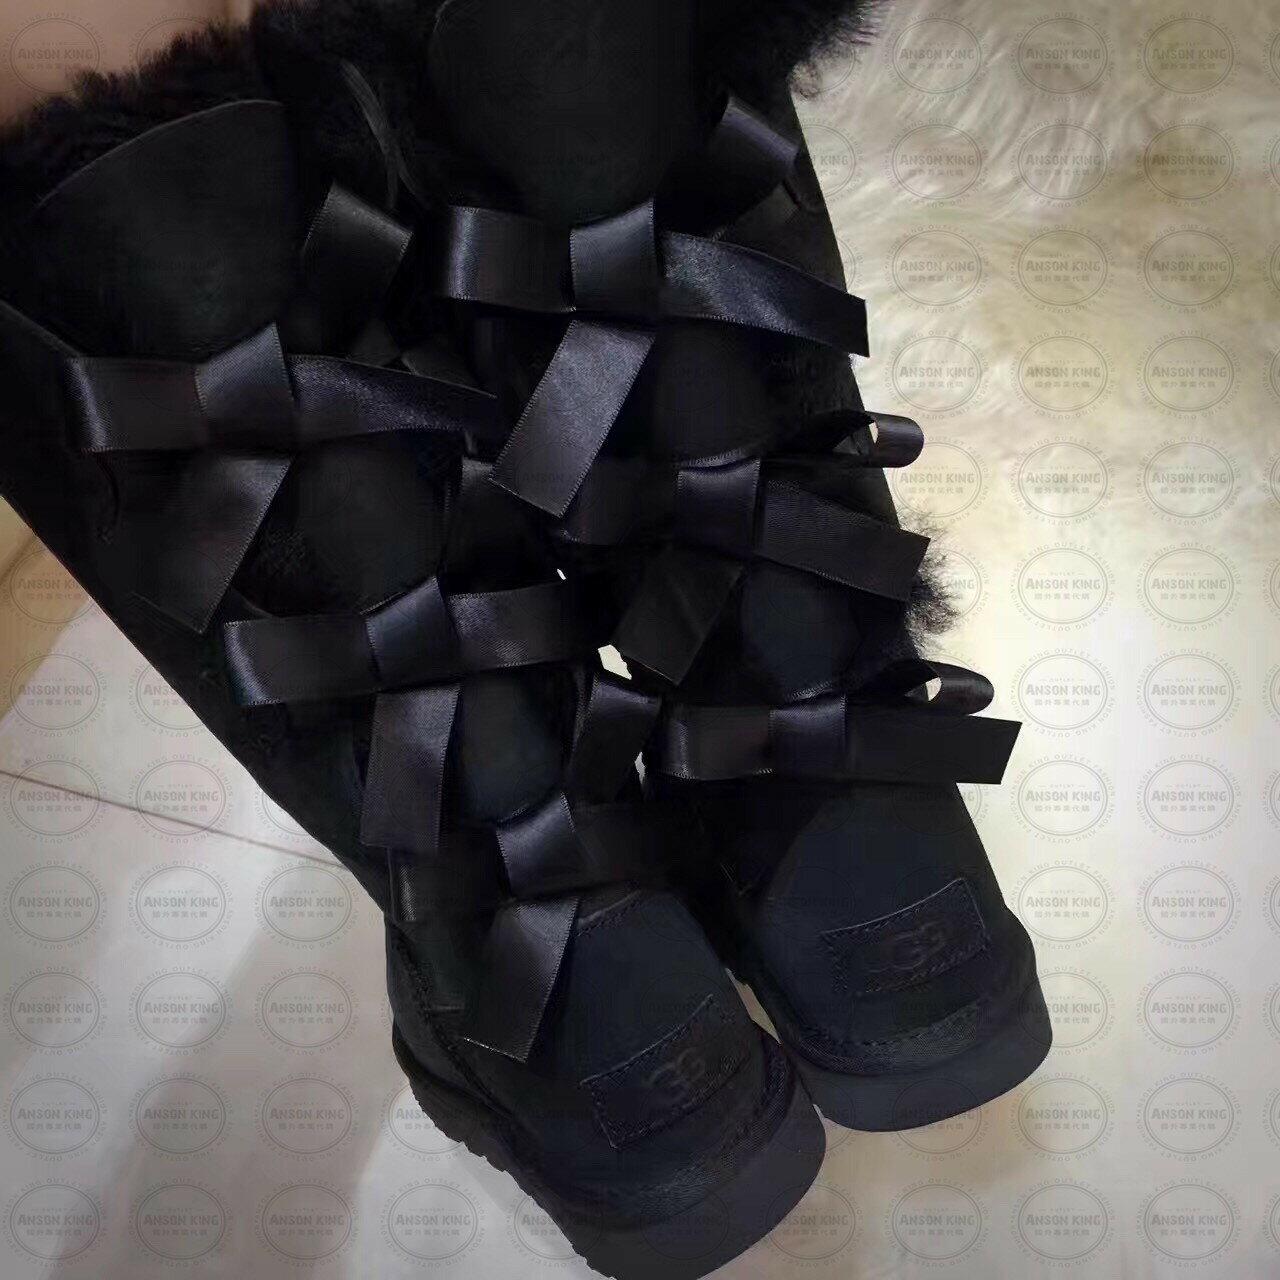 OUTLET正品代購 澳洲 UGG 一體女式絲帶蝴蝶結 保暖 真皮羊皮毛 雪靴 短靴 黑色 3